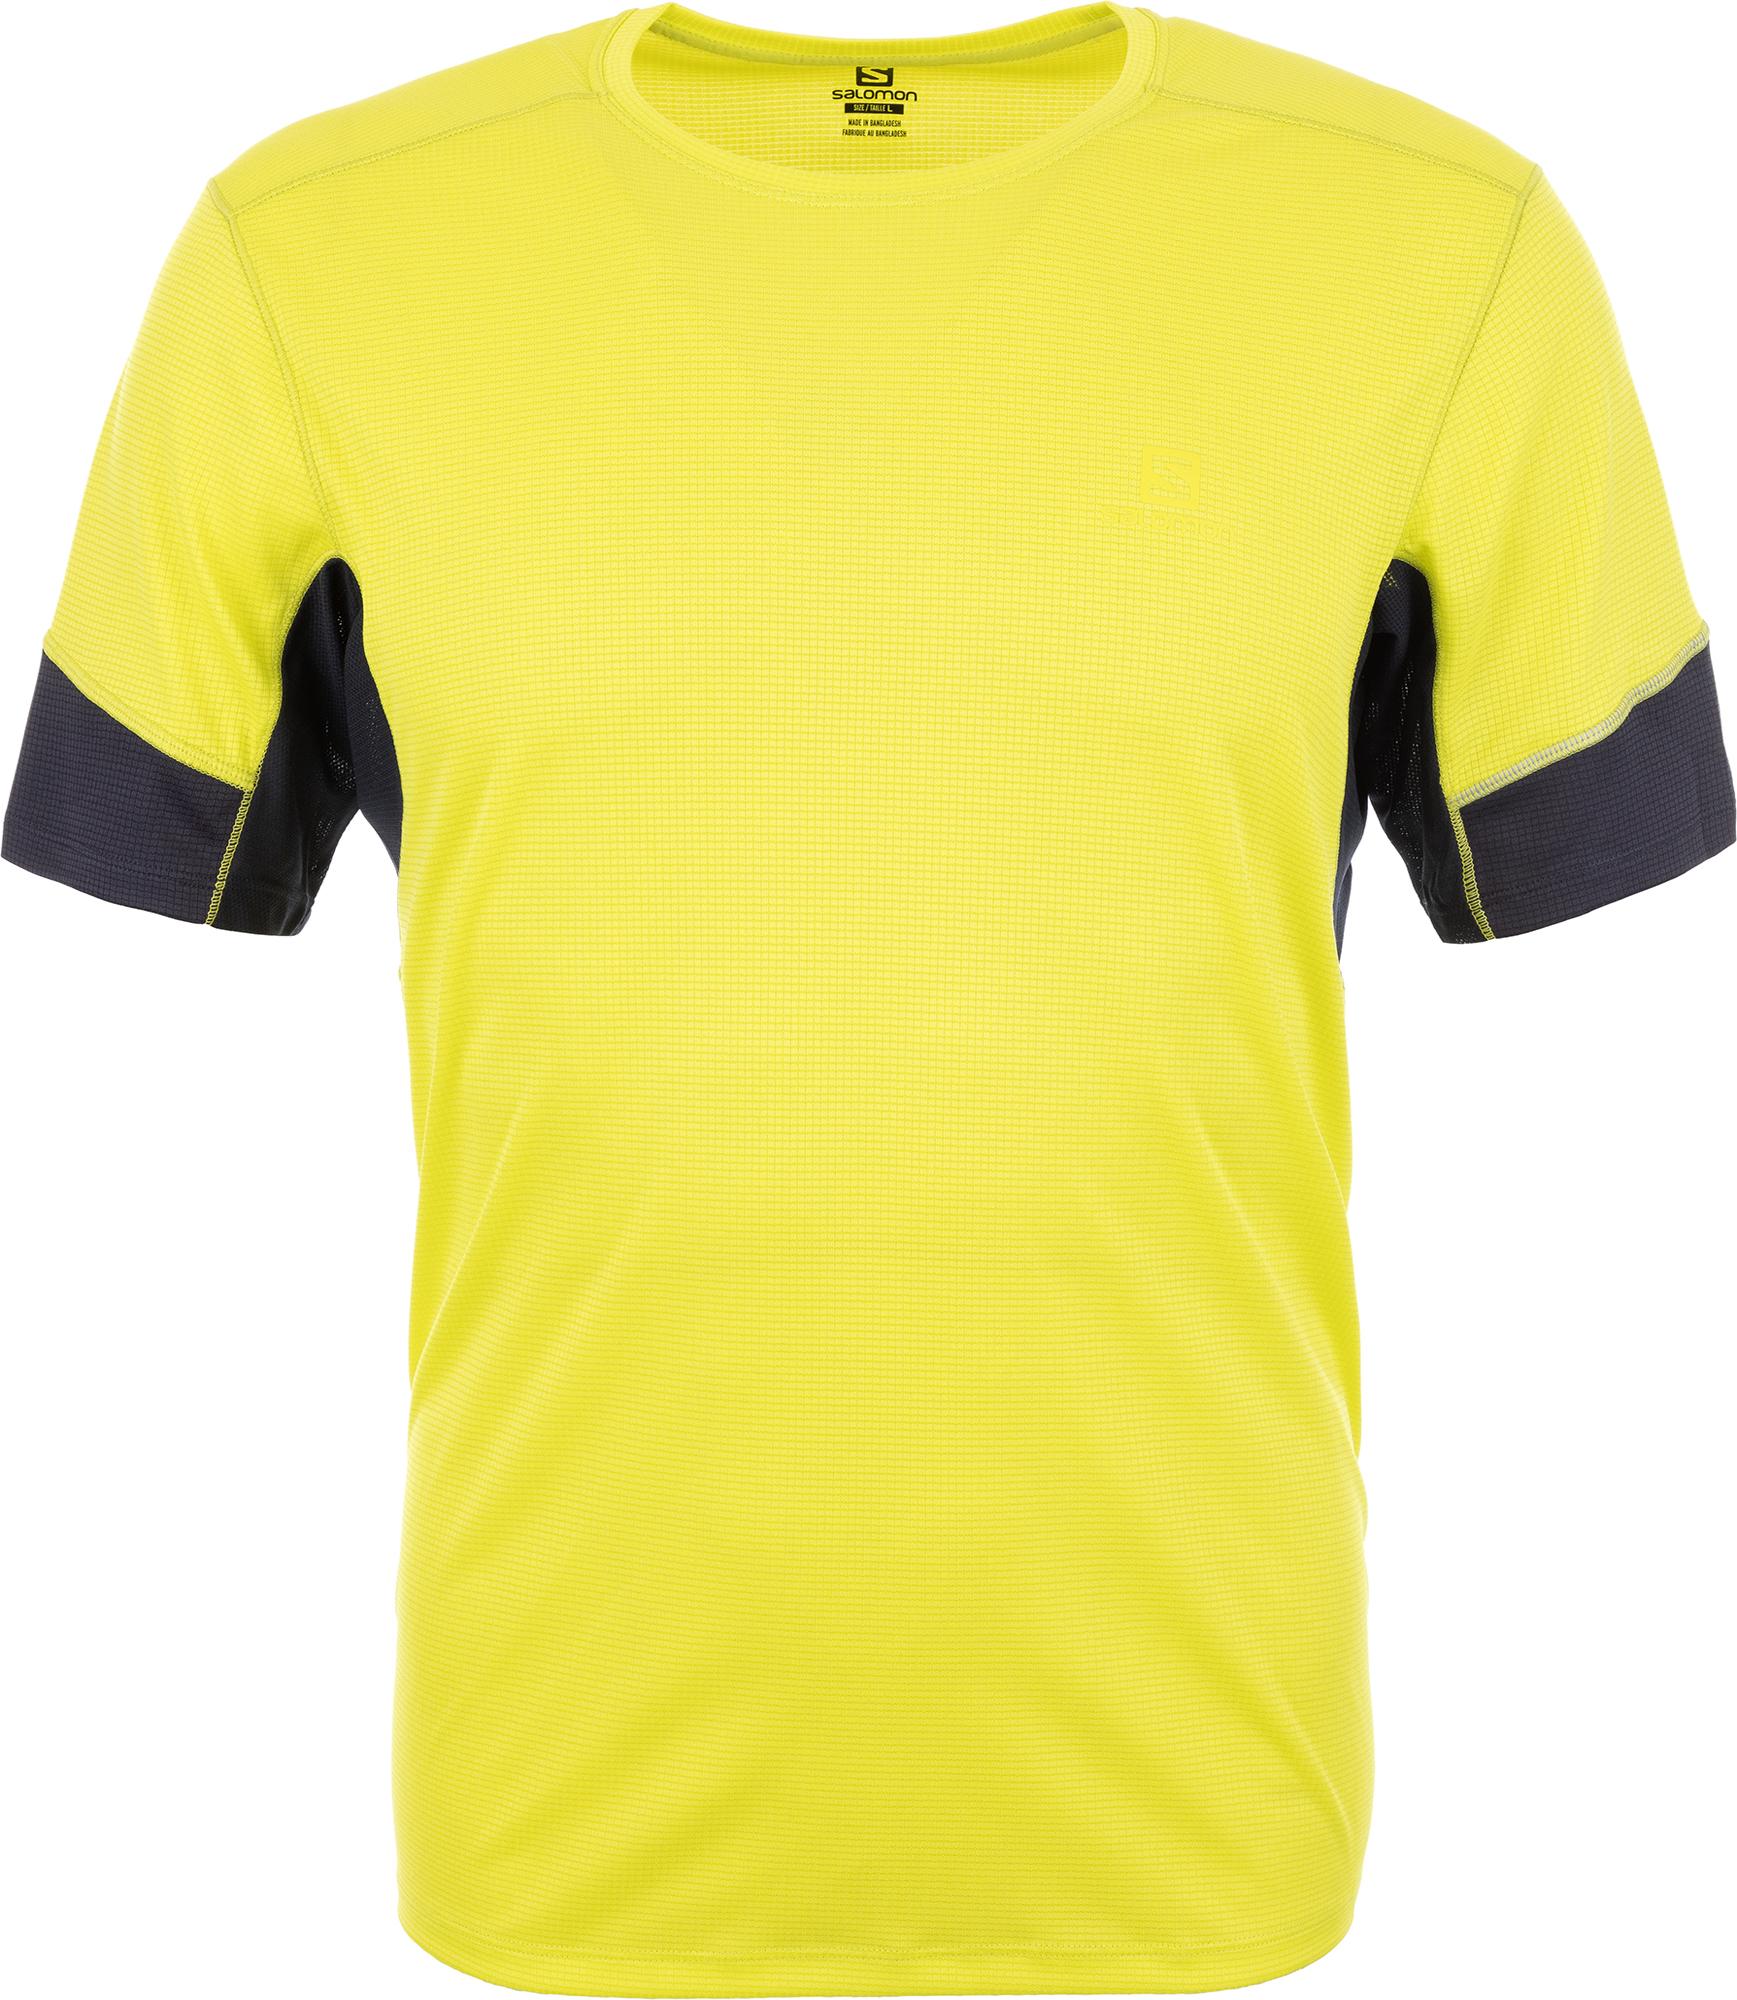 Salomon Футболка мужская Agile, размер 50-52